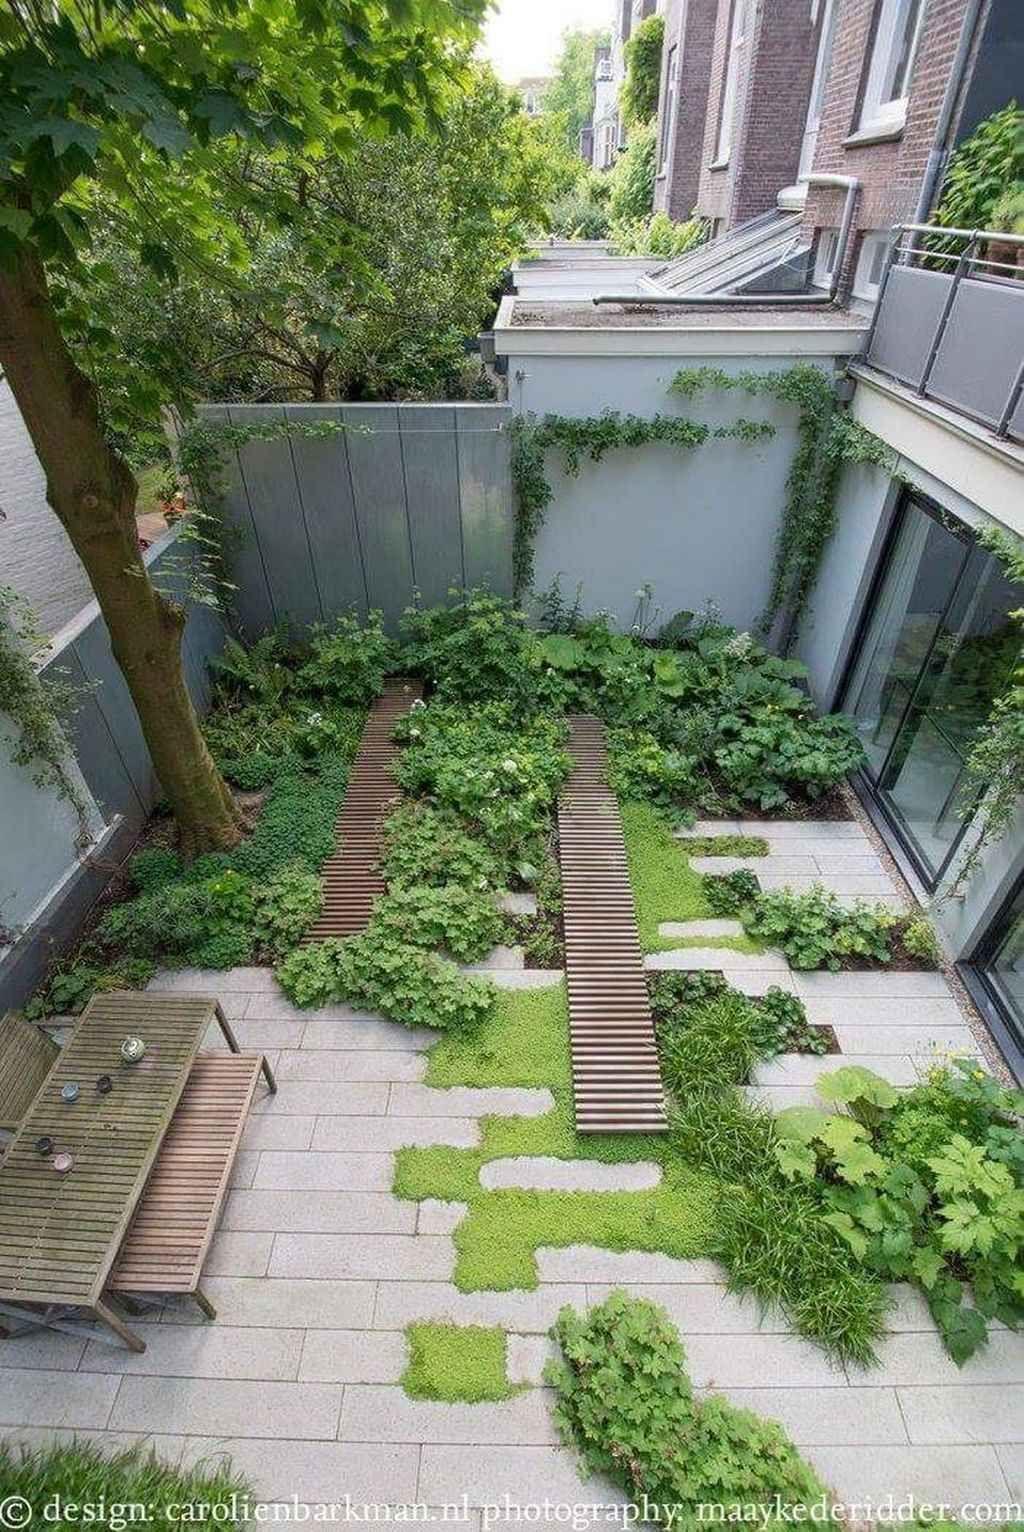 95 Inspiring Small Courtyard Garden Design Ideas Small Garden Landscape Small Courtyard Gardens Courtyard Landscaping